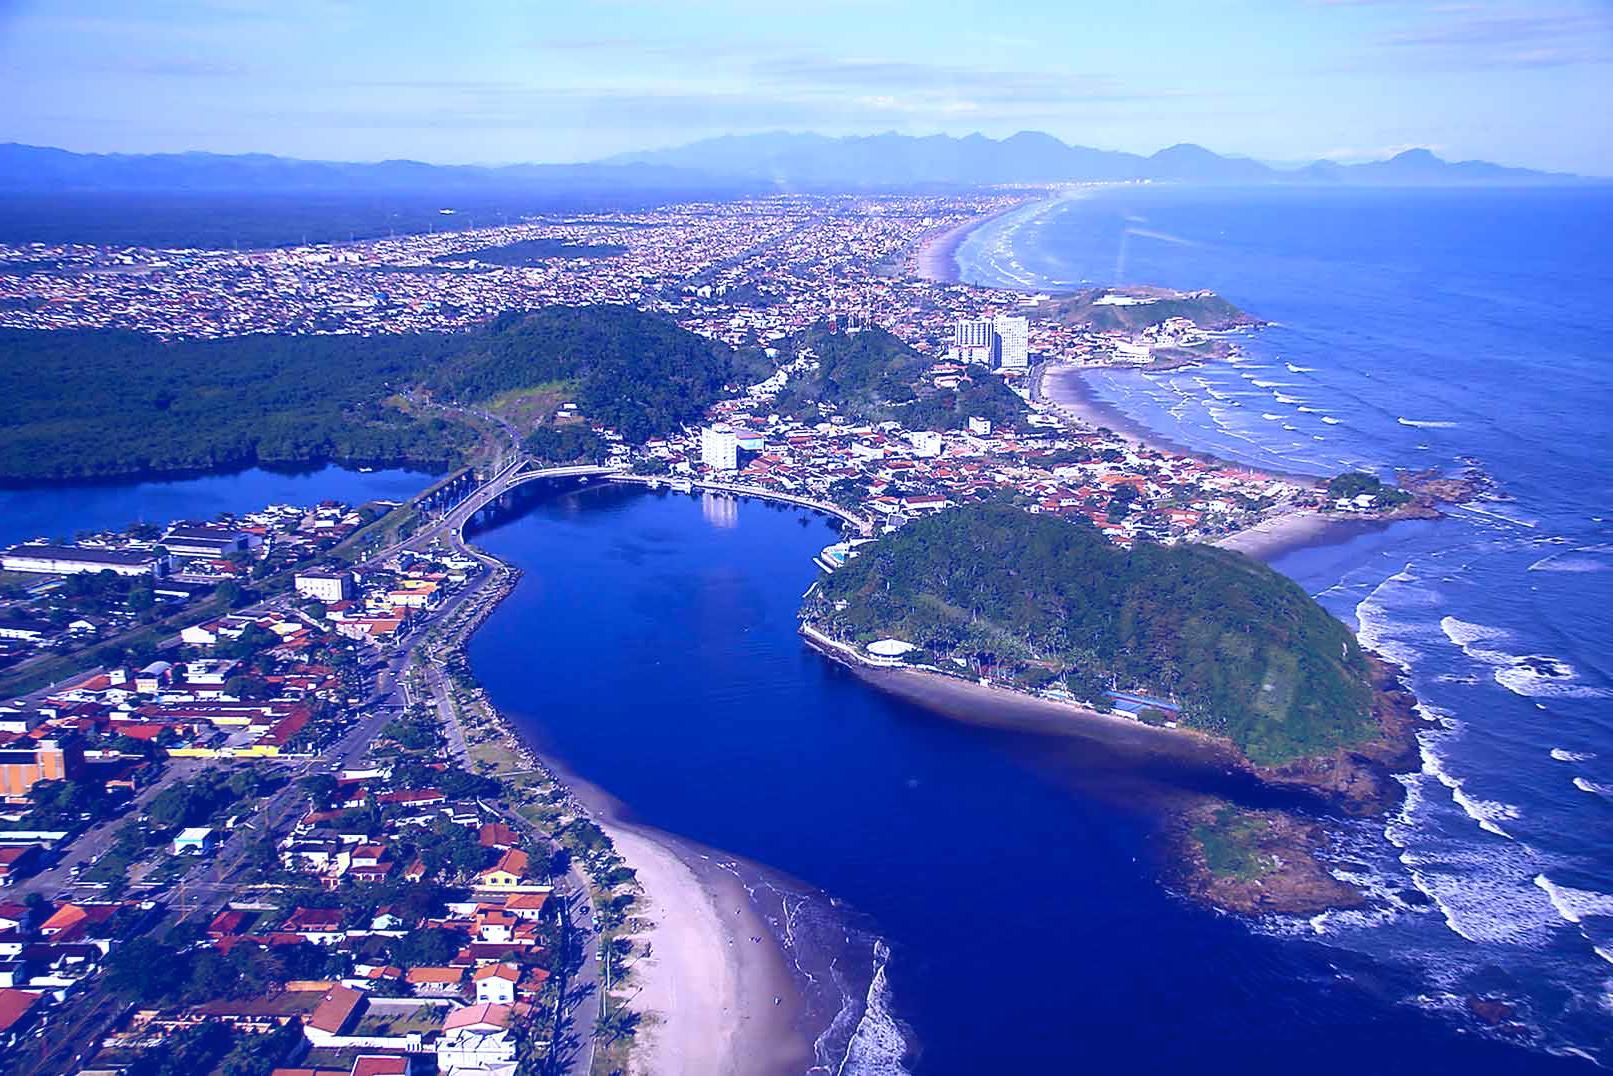 Mei Microempreendedor em Itanhaém, SP